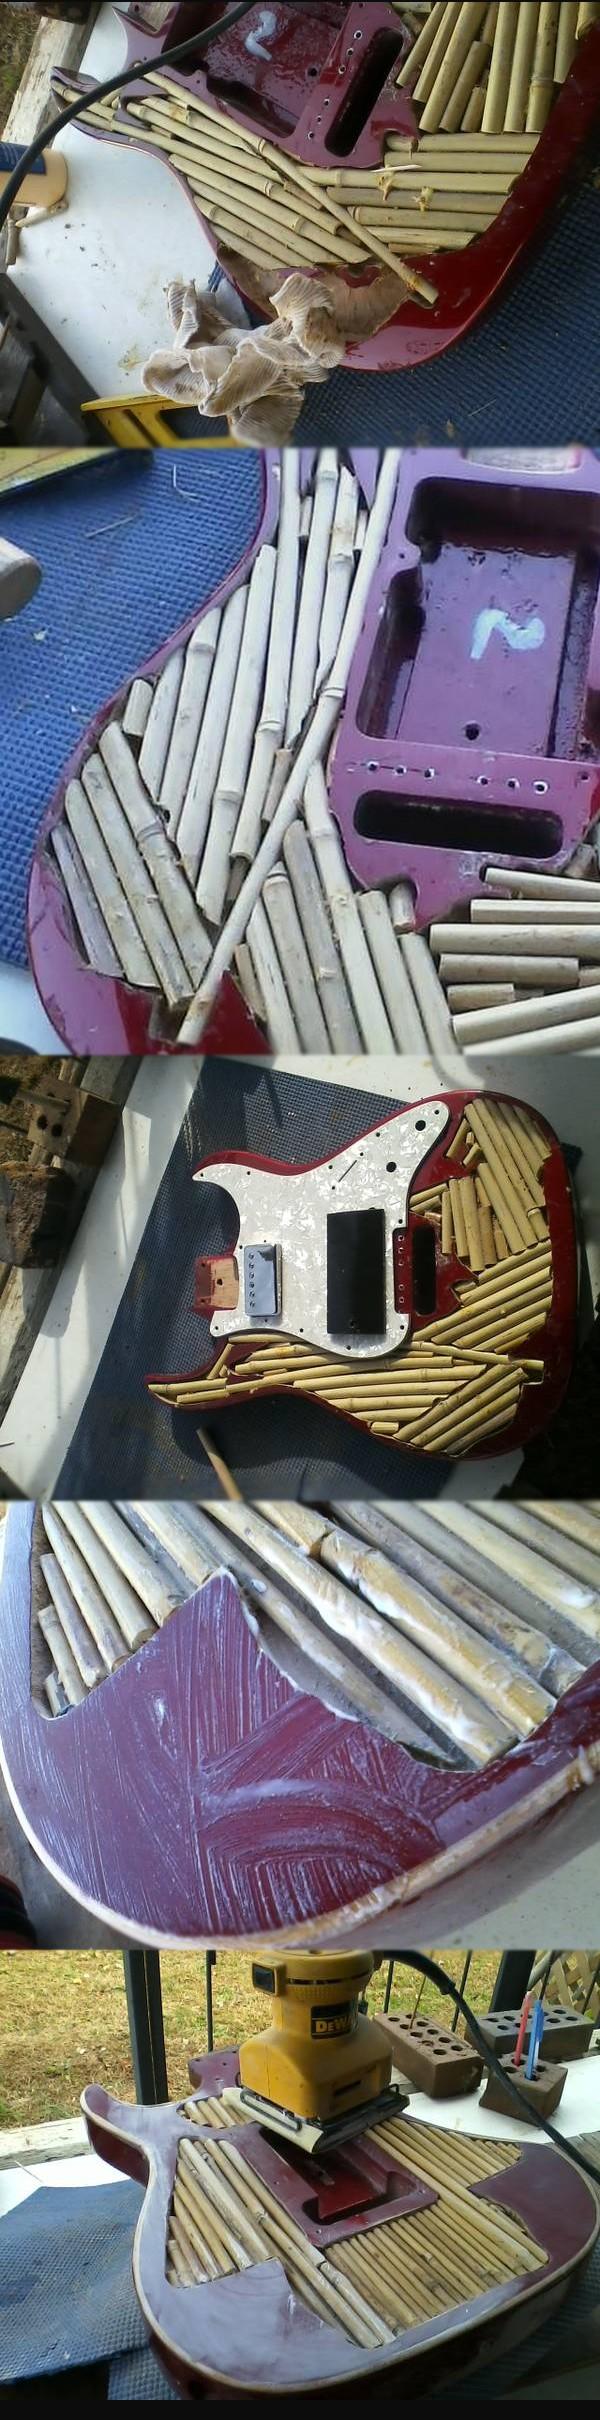 Ibanez-bamboo-guitar